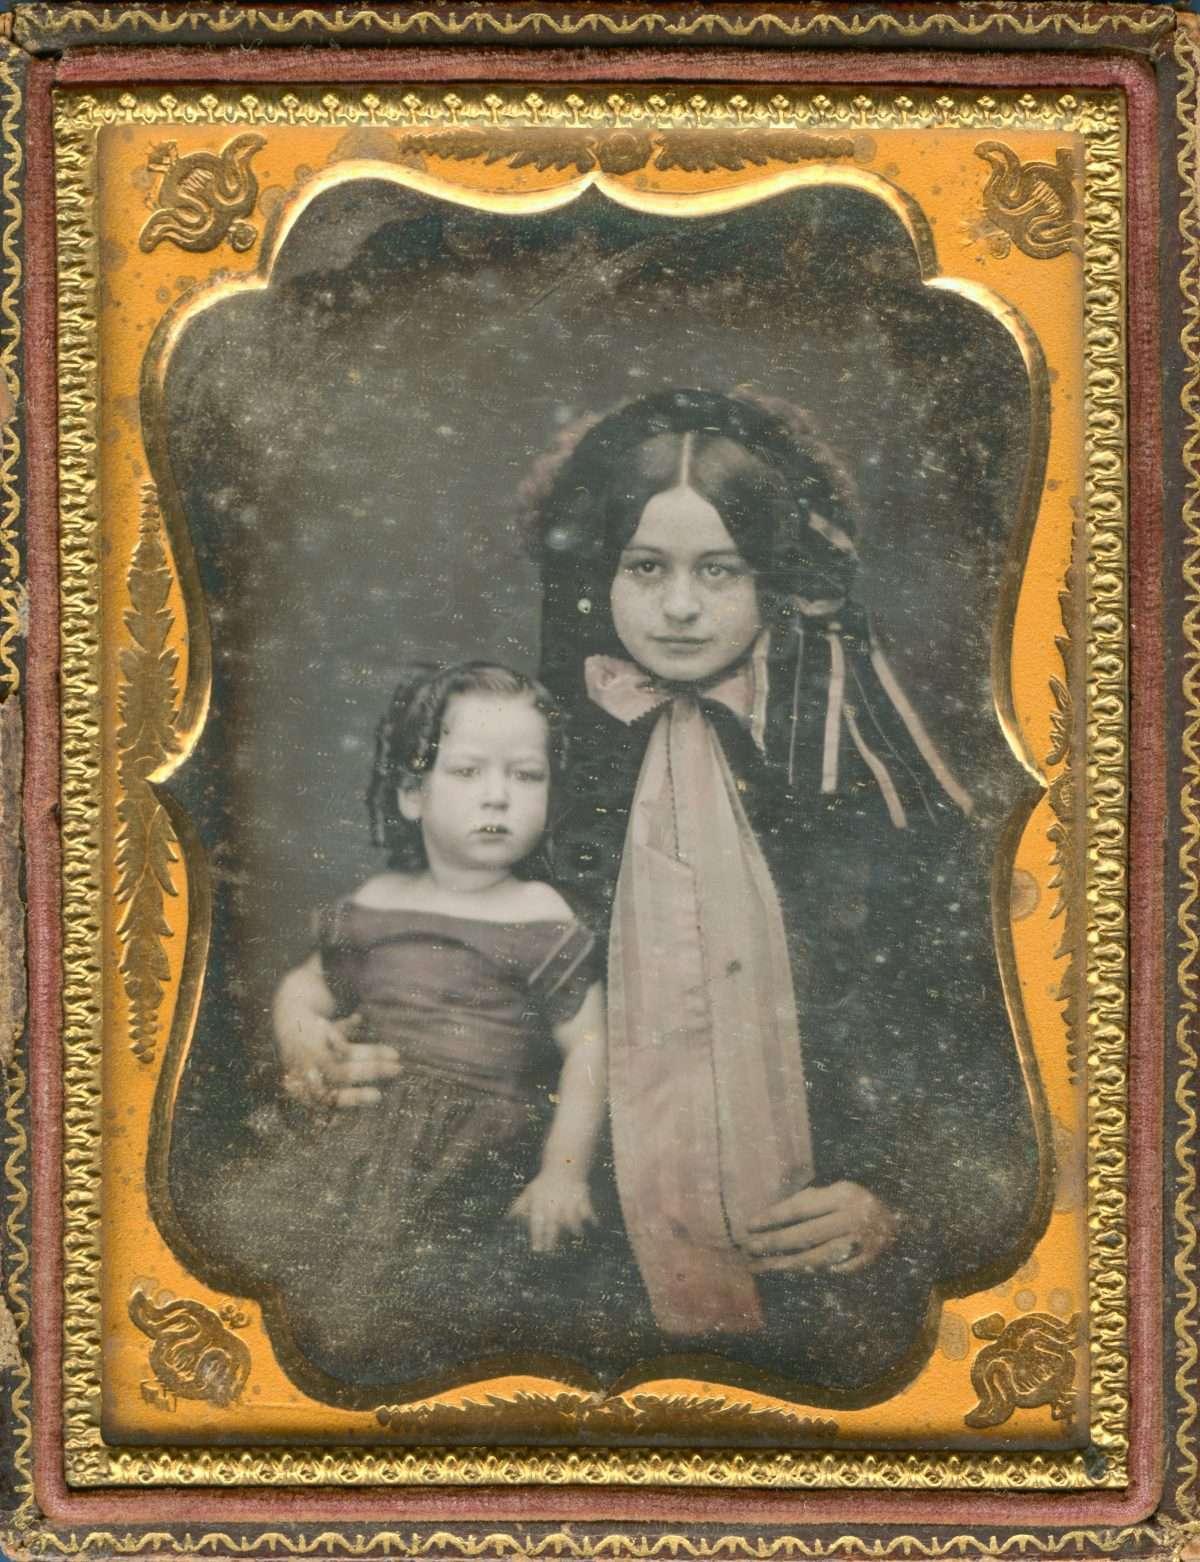 Mary Custis Lee and Robert E. Lee Jr.